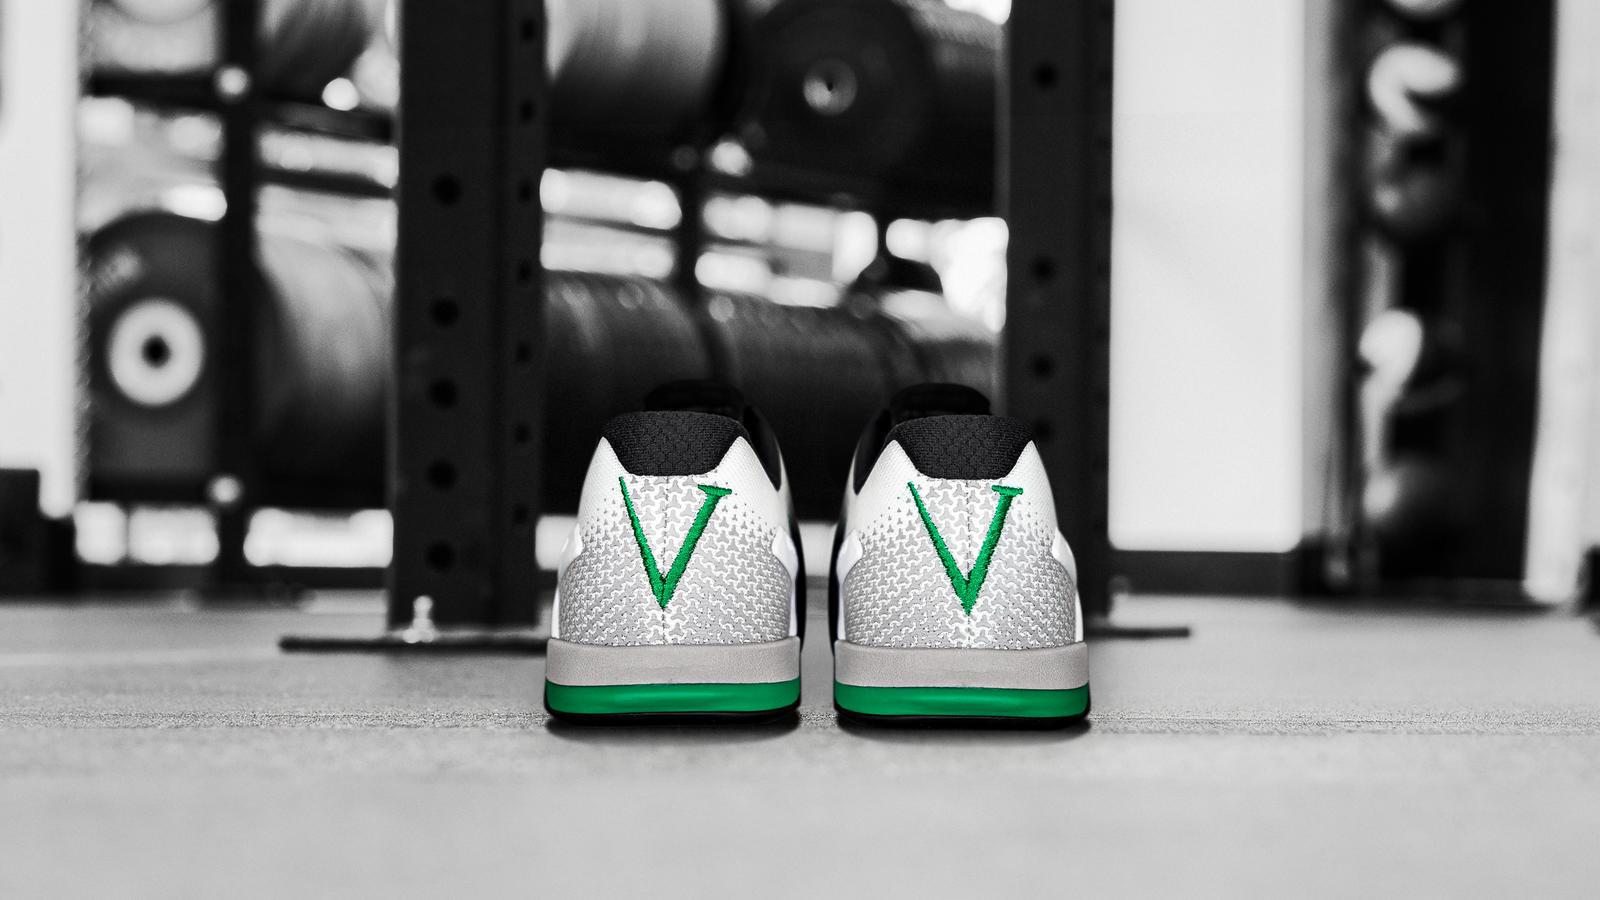 Nike Metcon 4 Invictus 2